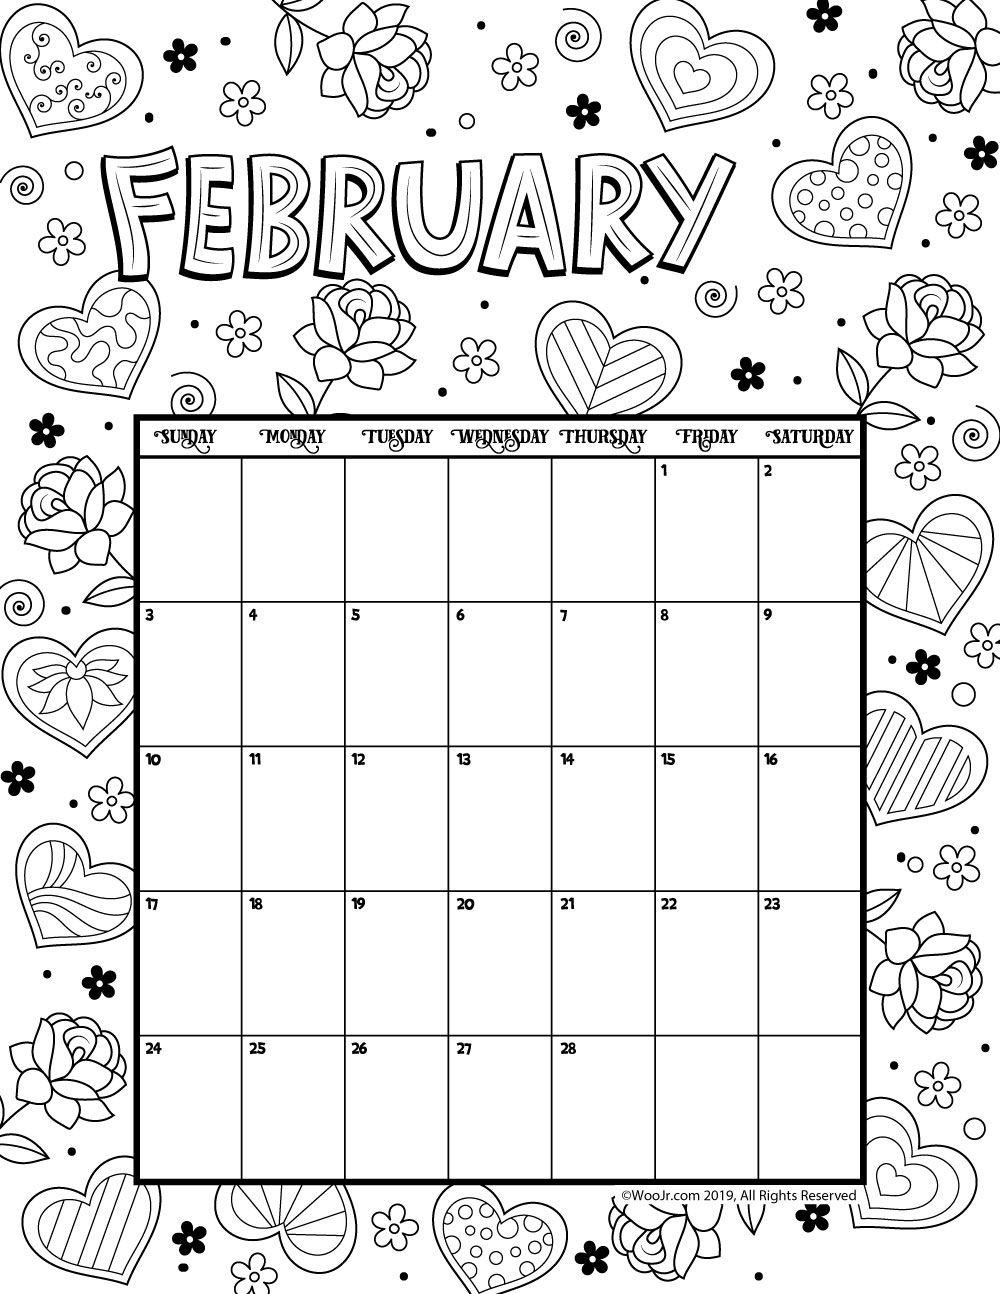 February 2019 Coloring Calendar Woo Jr Kids Activities Coloring Calendar Kids Calendar Calendar Pages